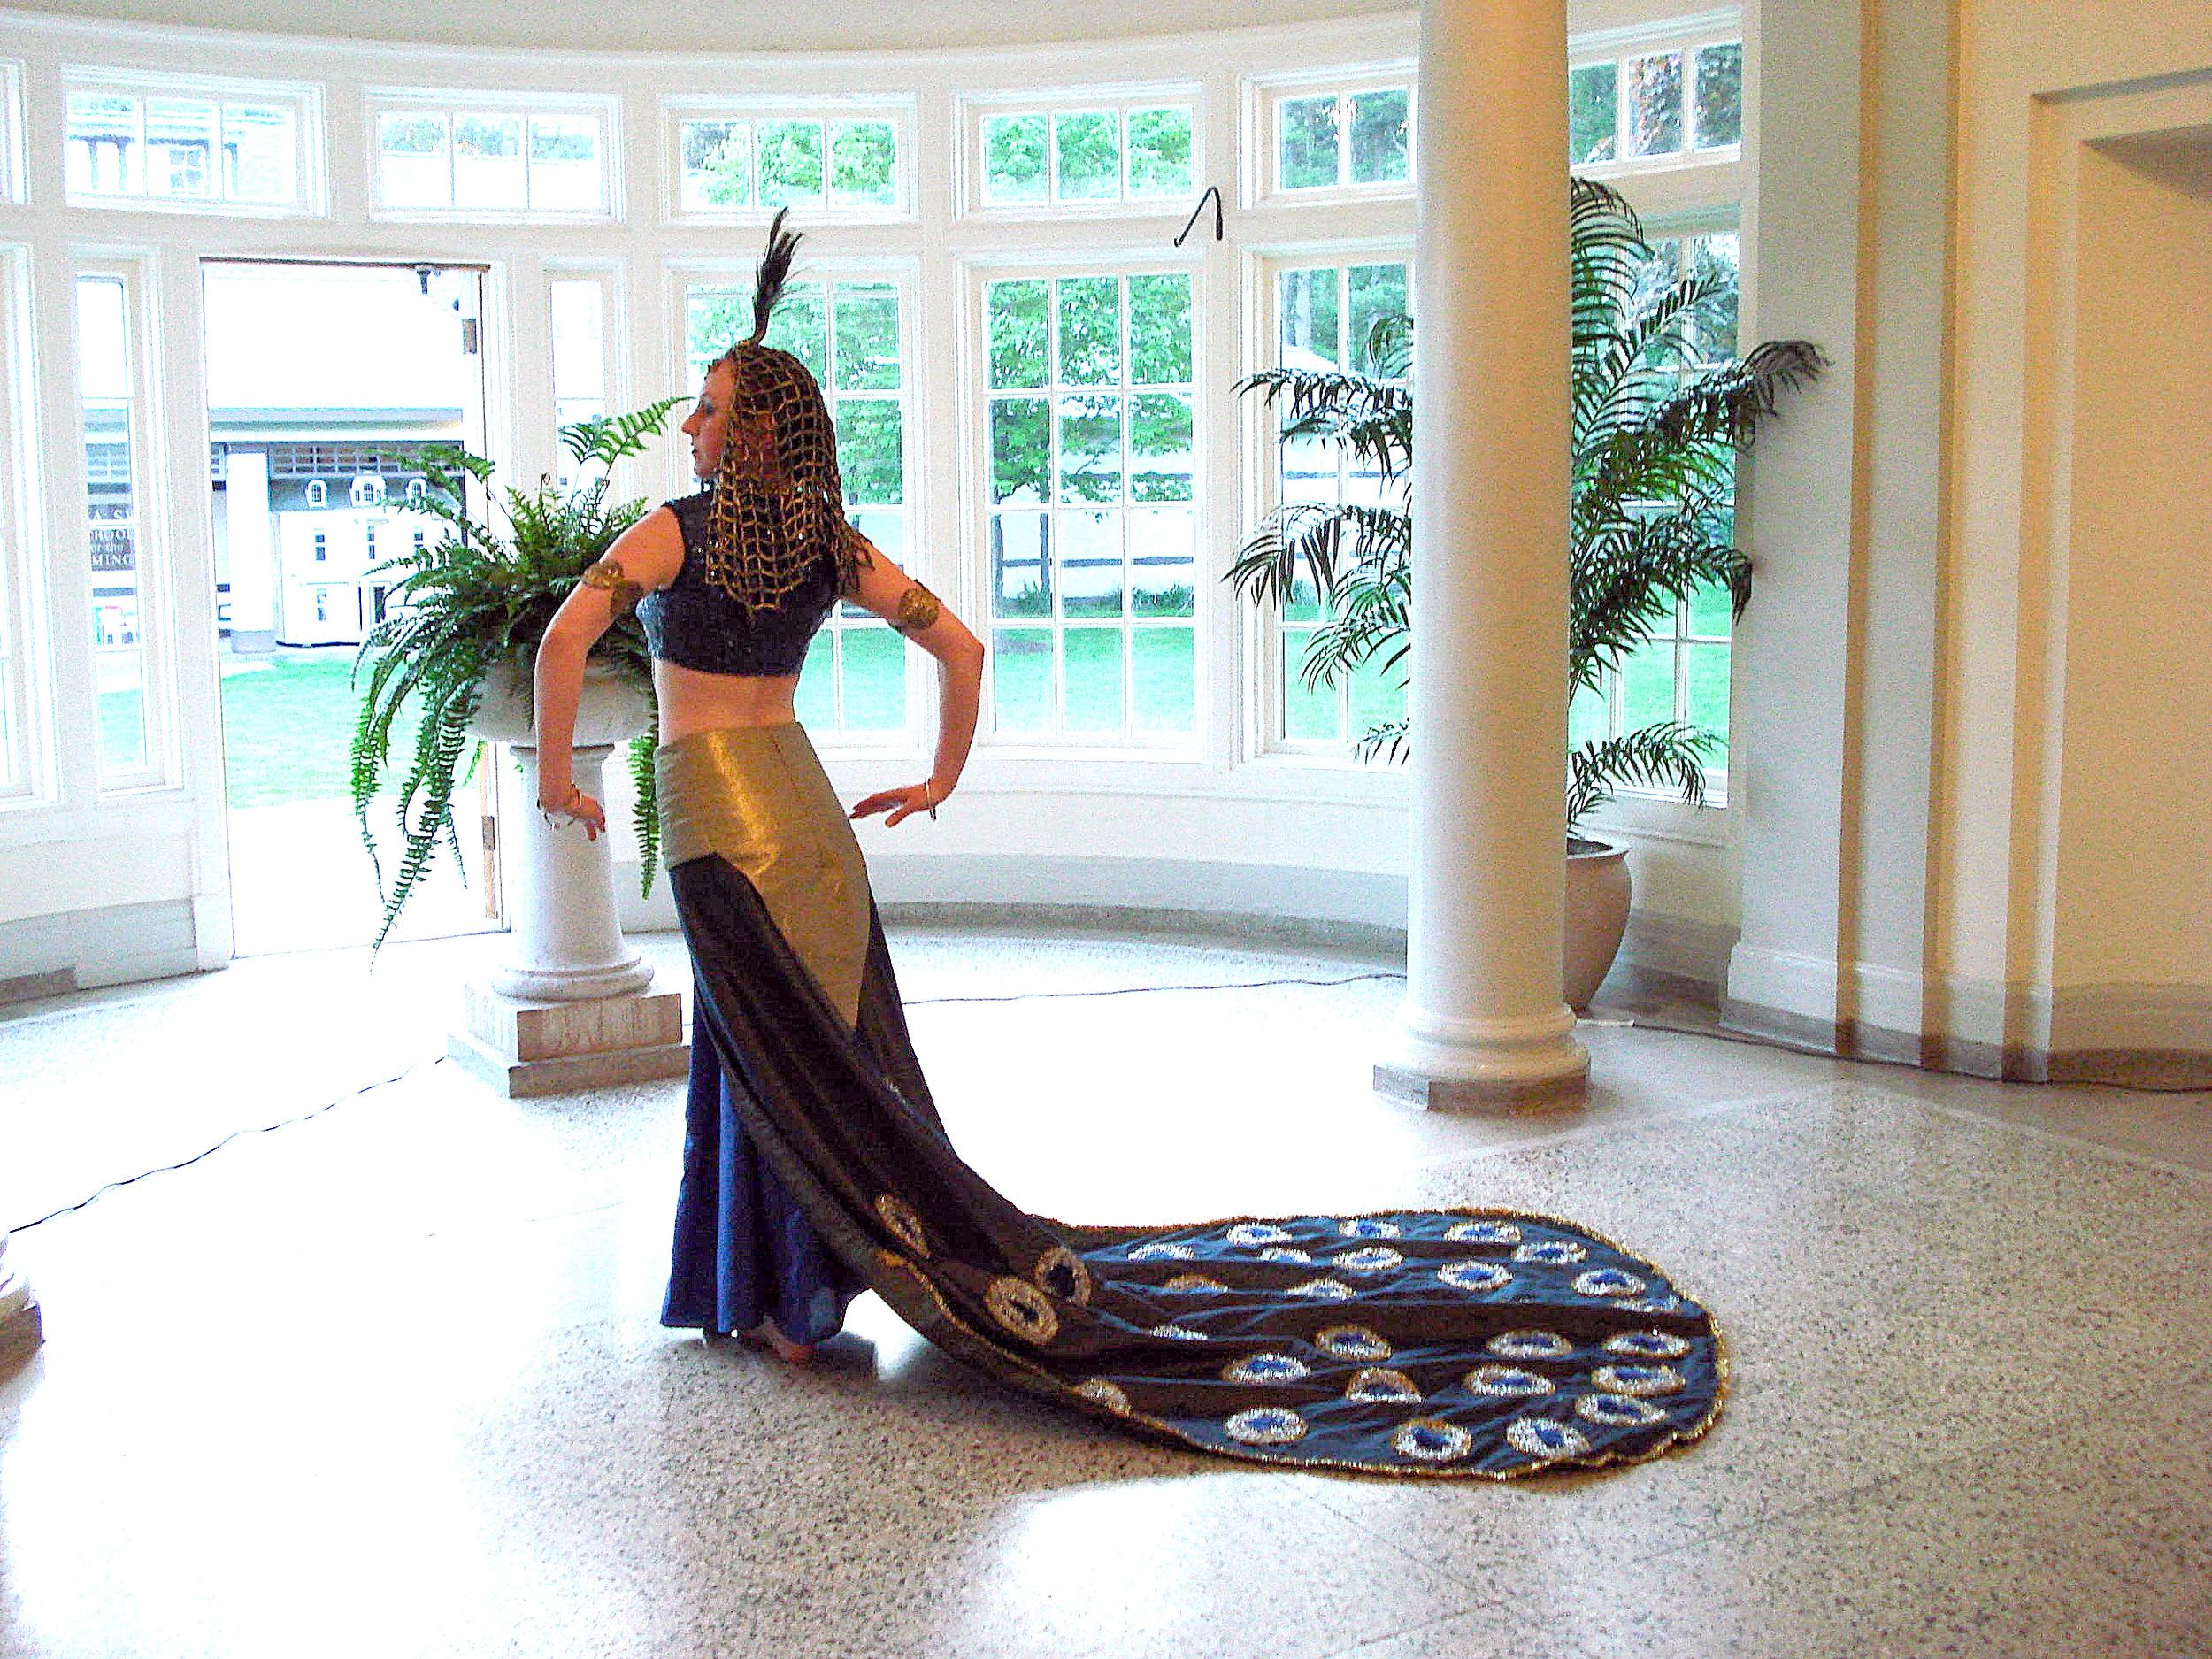 Peacock dress, Amber, Museum of Dance, Saratoga, 2007 015.jpg